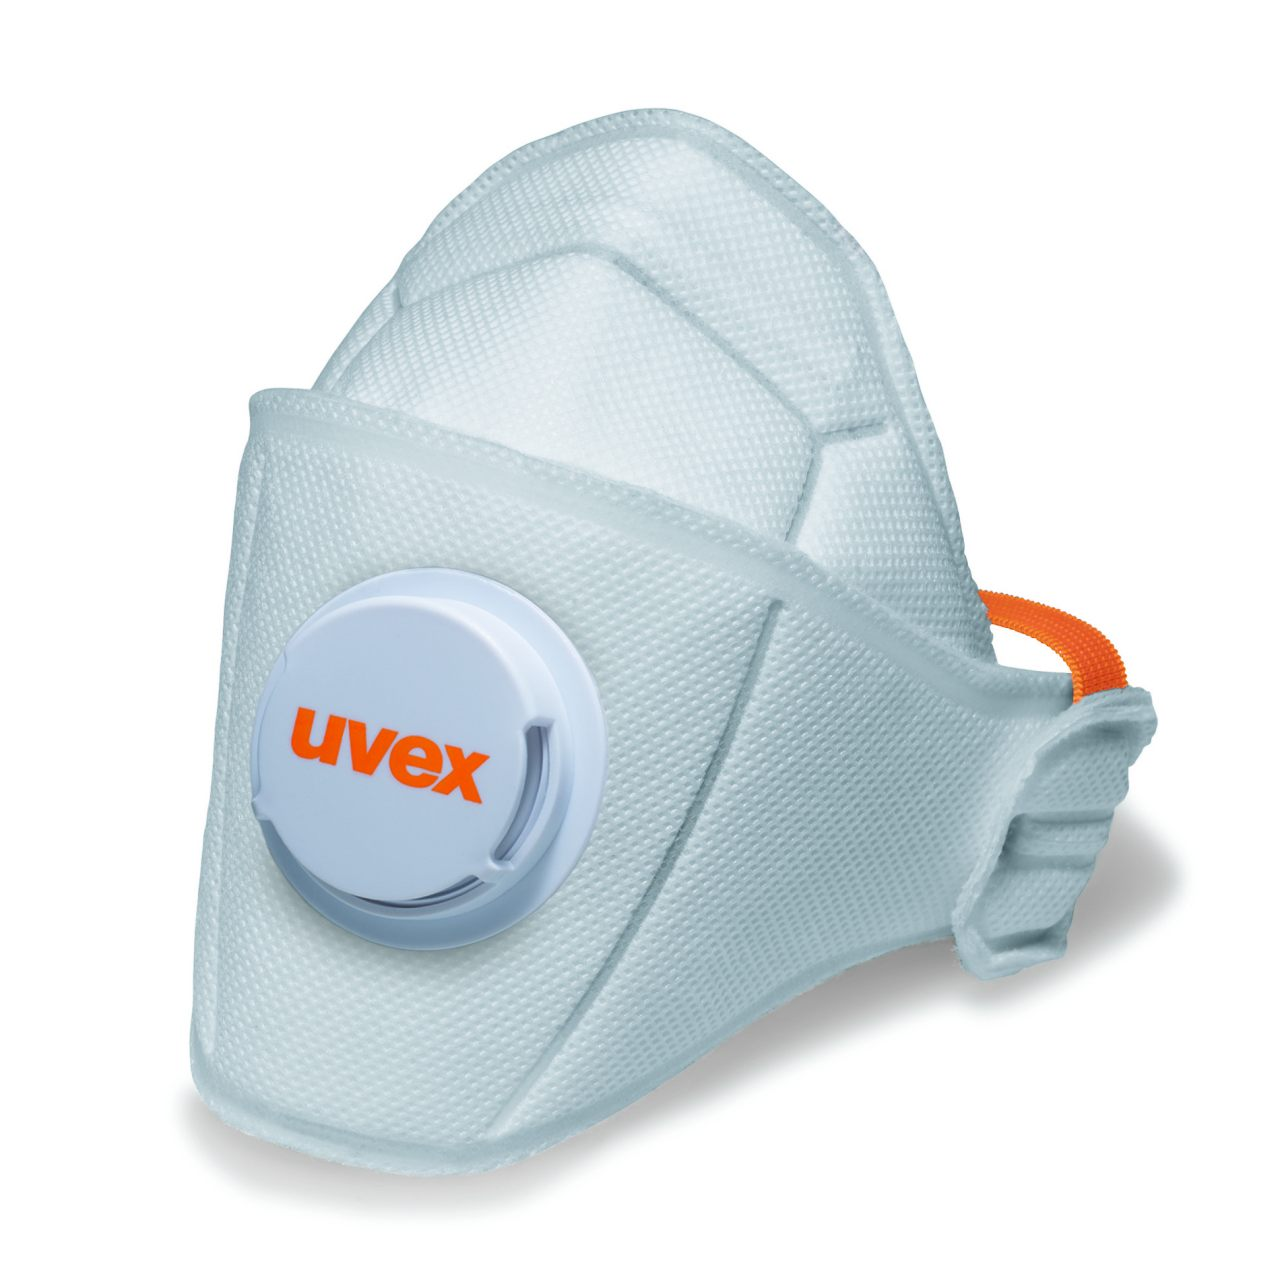 FFP2-Atemschutz-Faltmaske uvex silv-Air 5210 premium